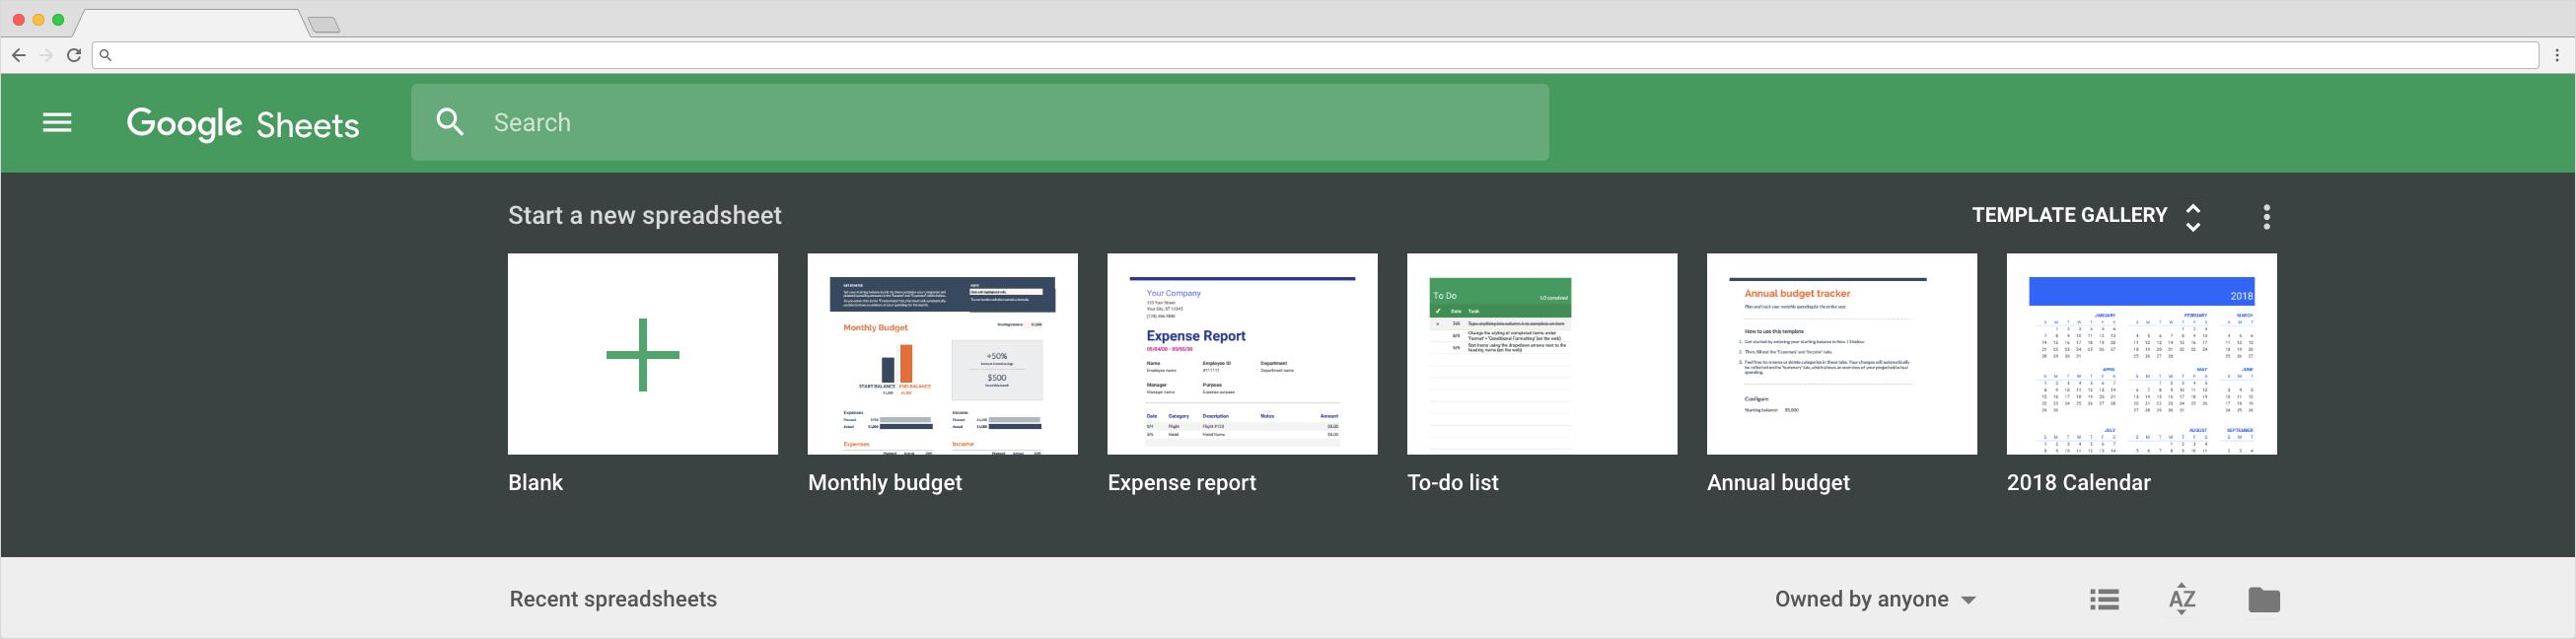 Google Spreadsheet Inventory Template Inside Top 5 Free Google Sheets Inventory Templates · Blog Sheetgo